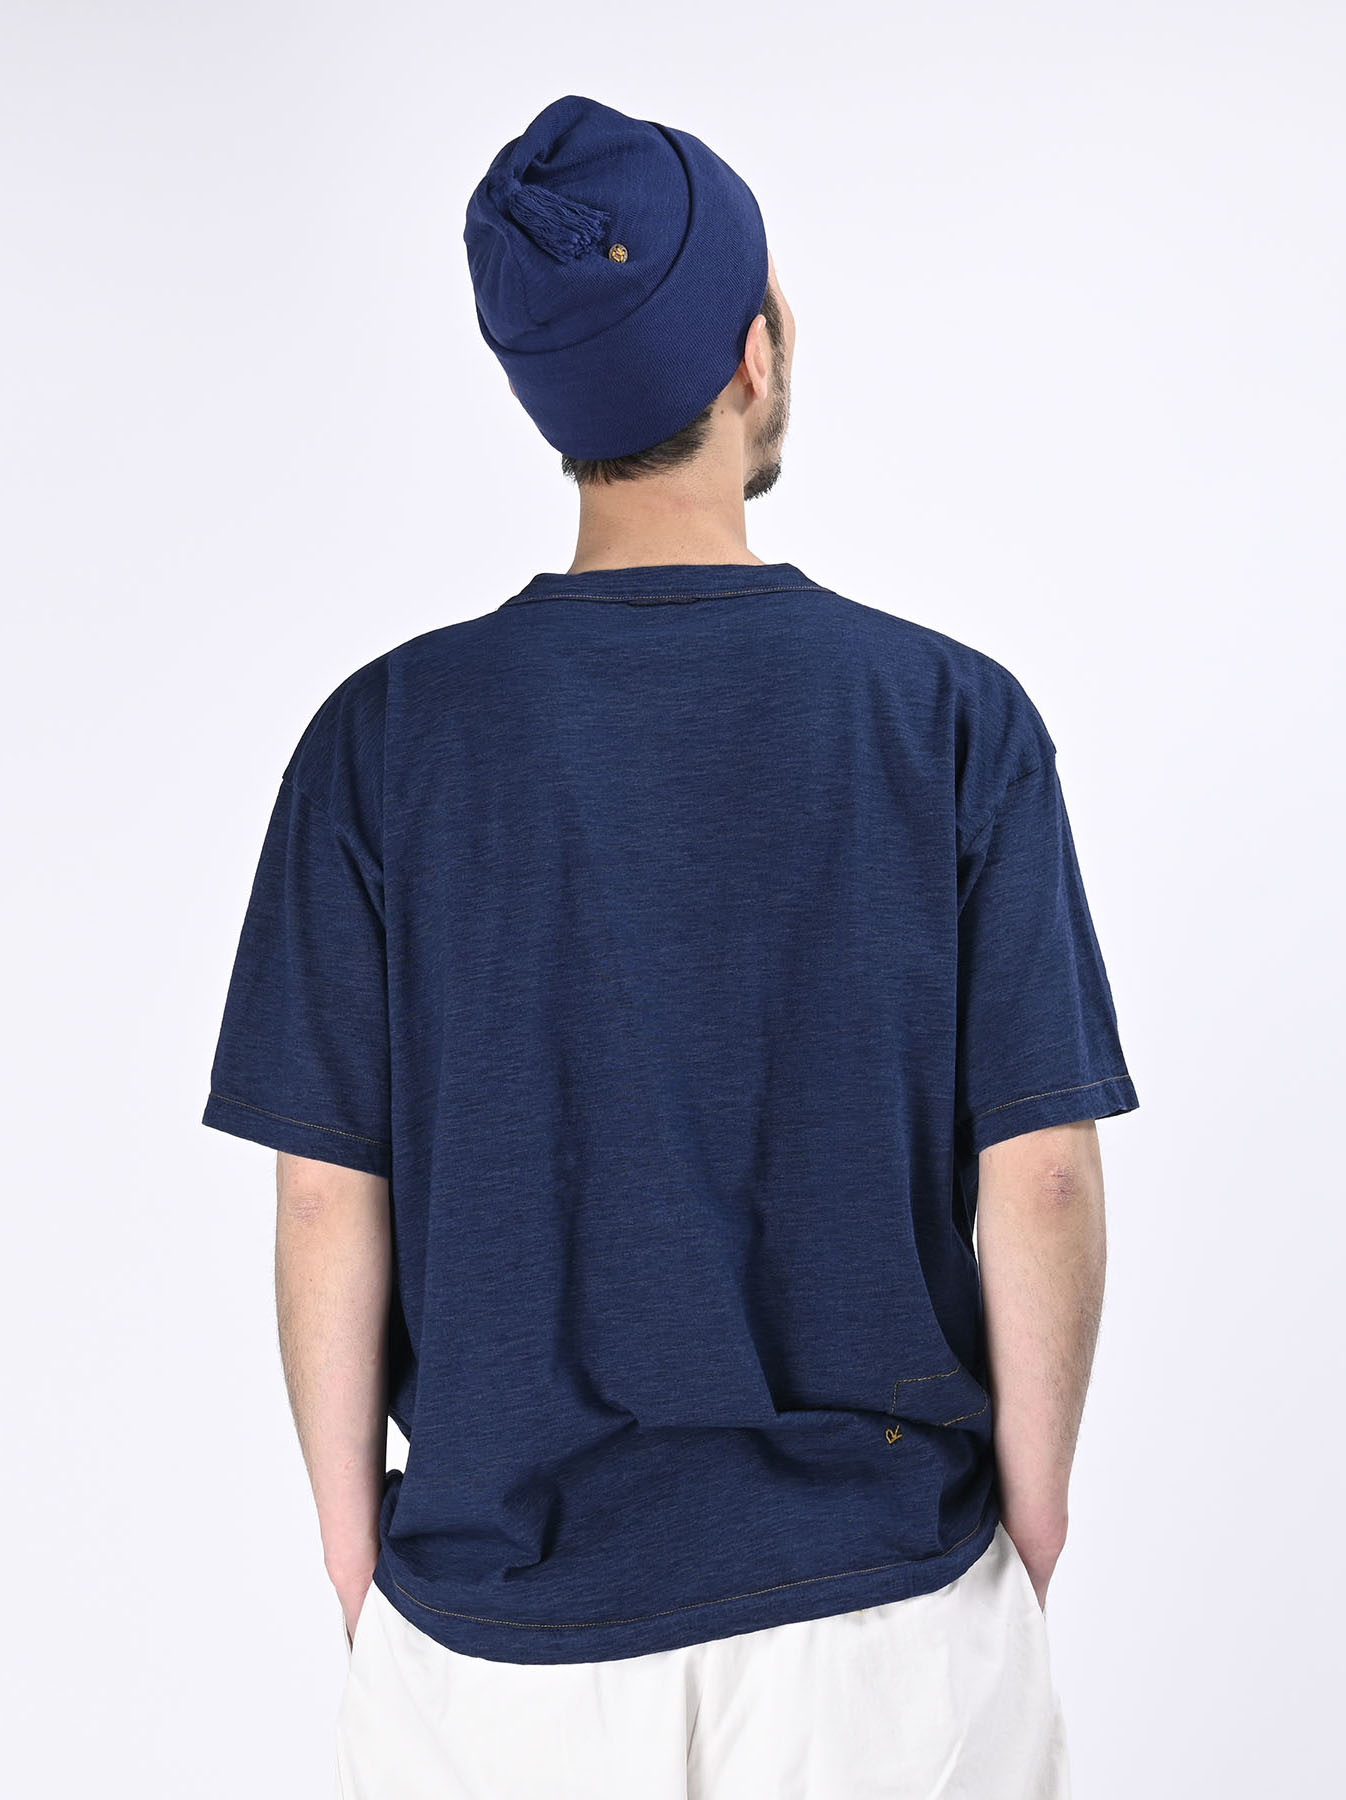 One Wash Indigo Tenjiku 908 Ocean T-Shirt (0621)-5